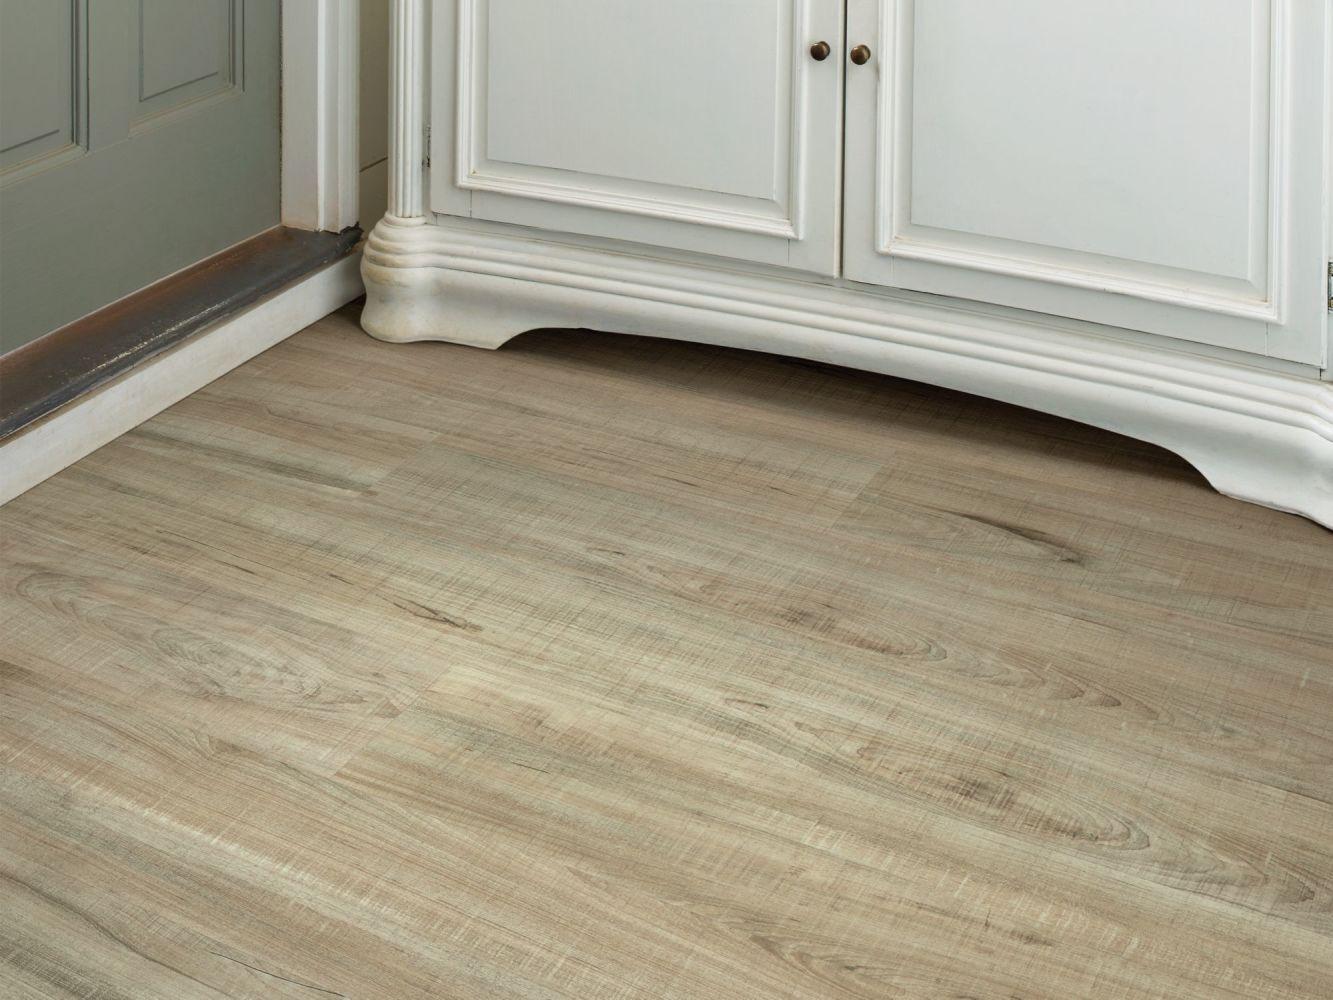 Shaw Floors Travera Plus 20 Chatter Oak 00295_FR622